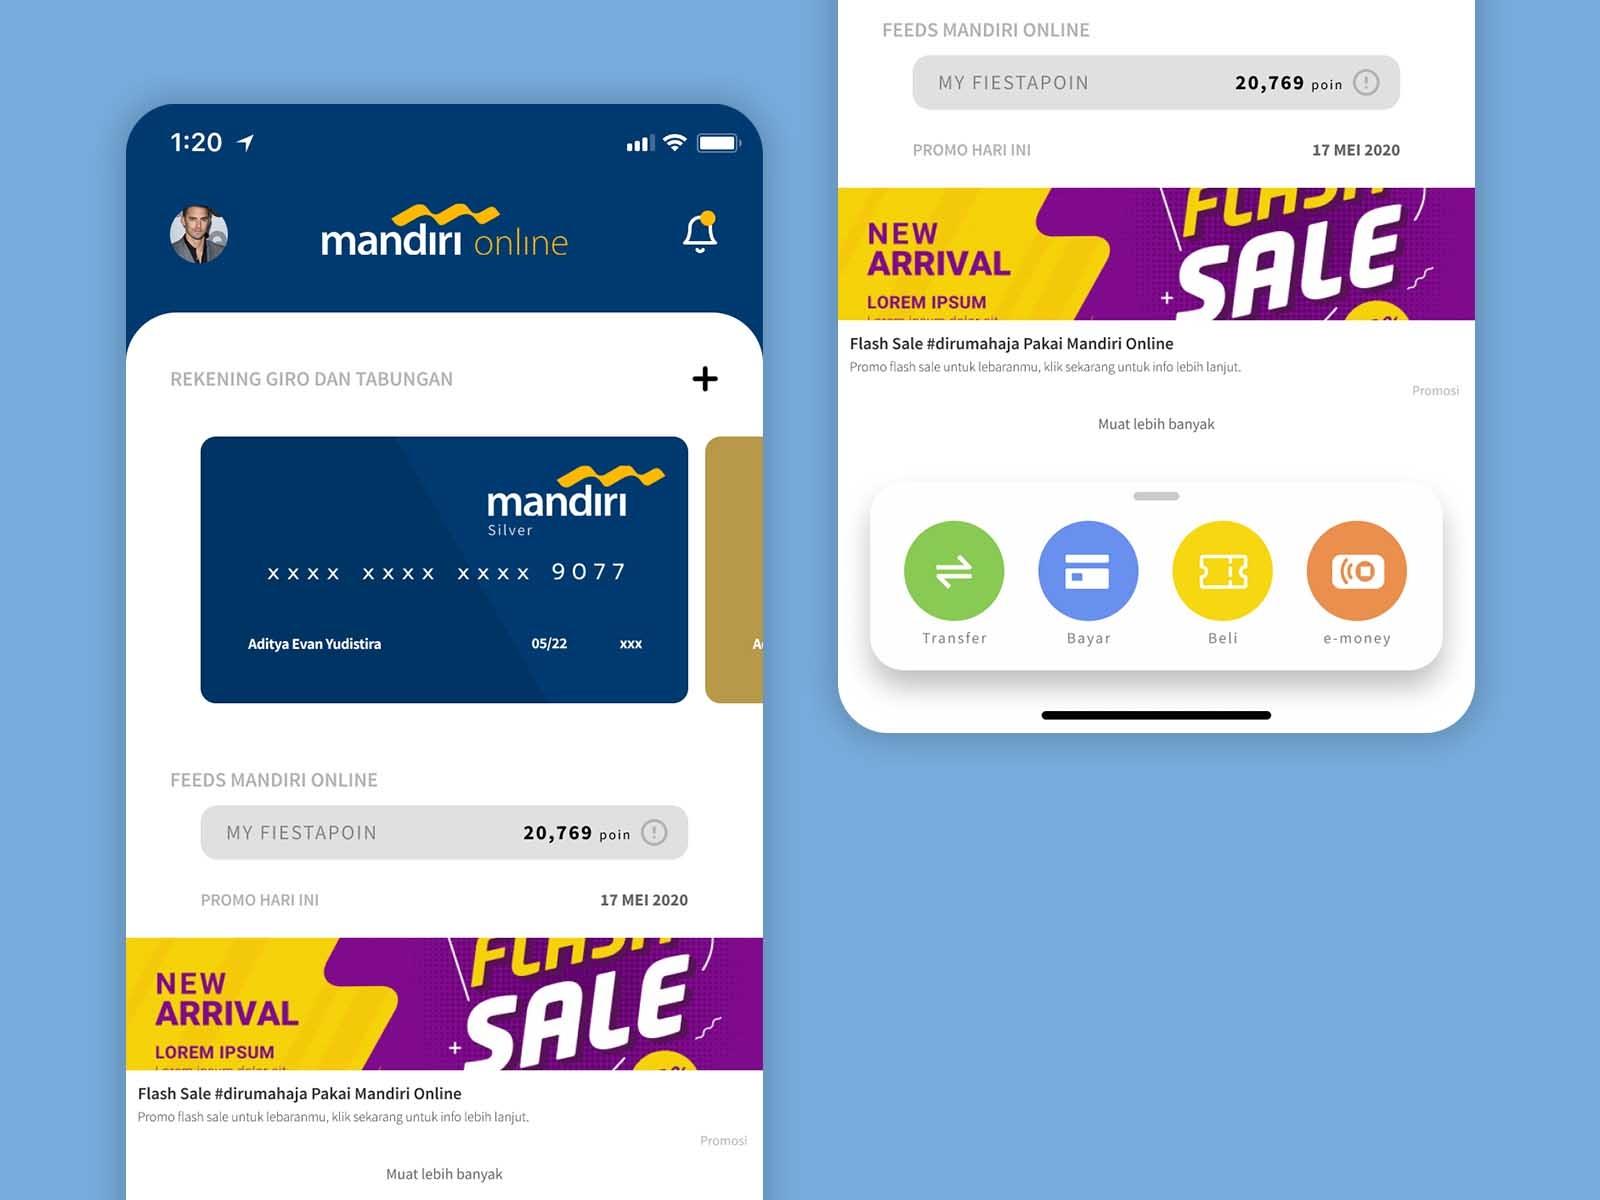 Mandiri Online App Redesign By Evan Yudistira On Dribbble